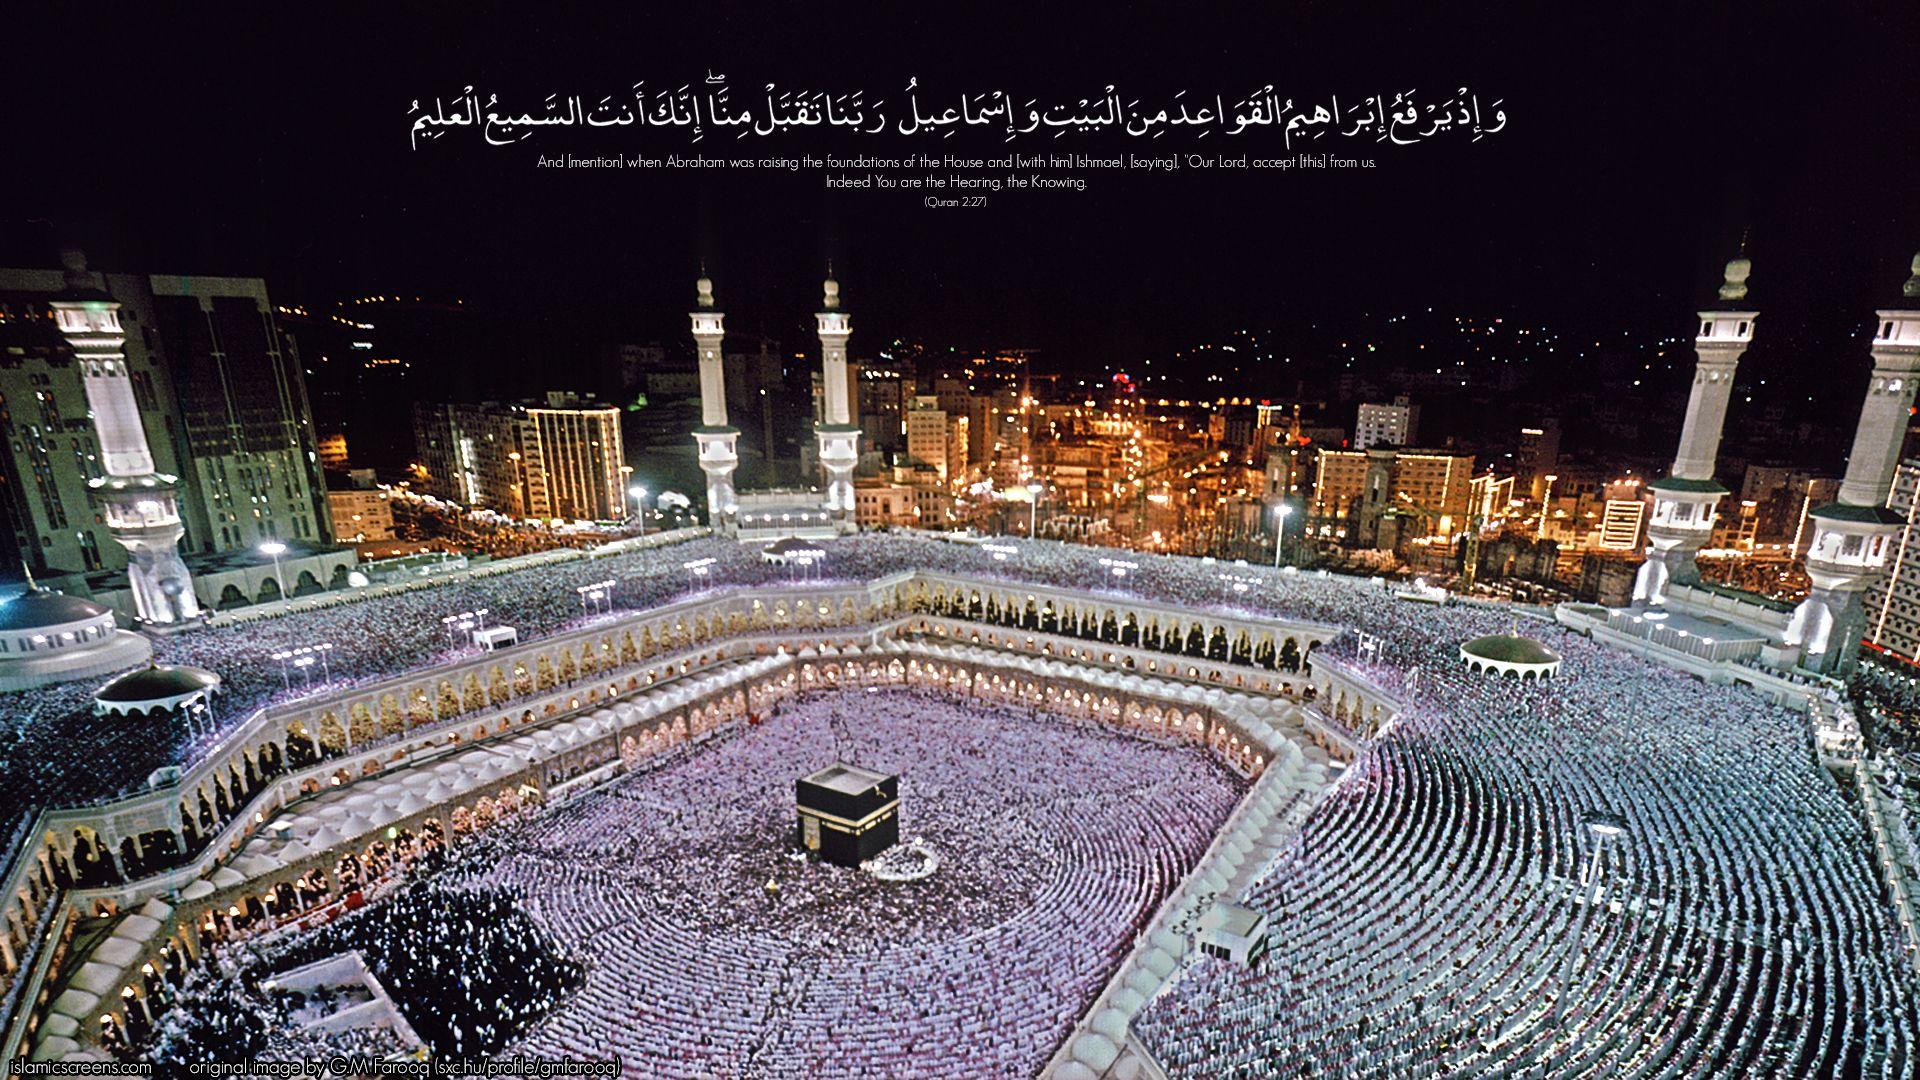 Popular Wallpaper High Resolution Makkah - b764eba8a0834c9ec86e3db5a45a56e5  Graphic_818043.jpg